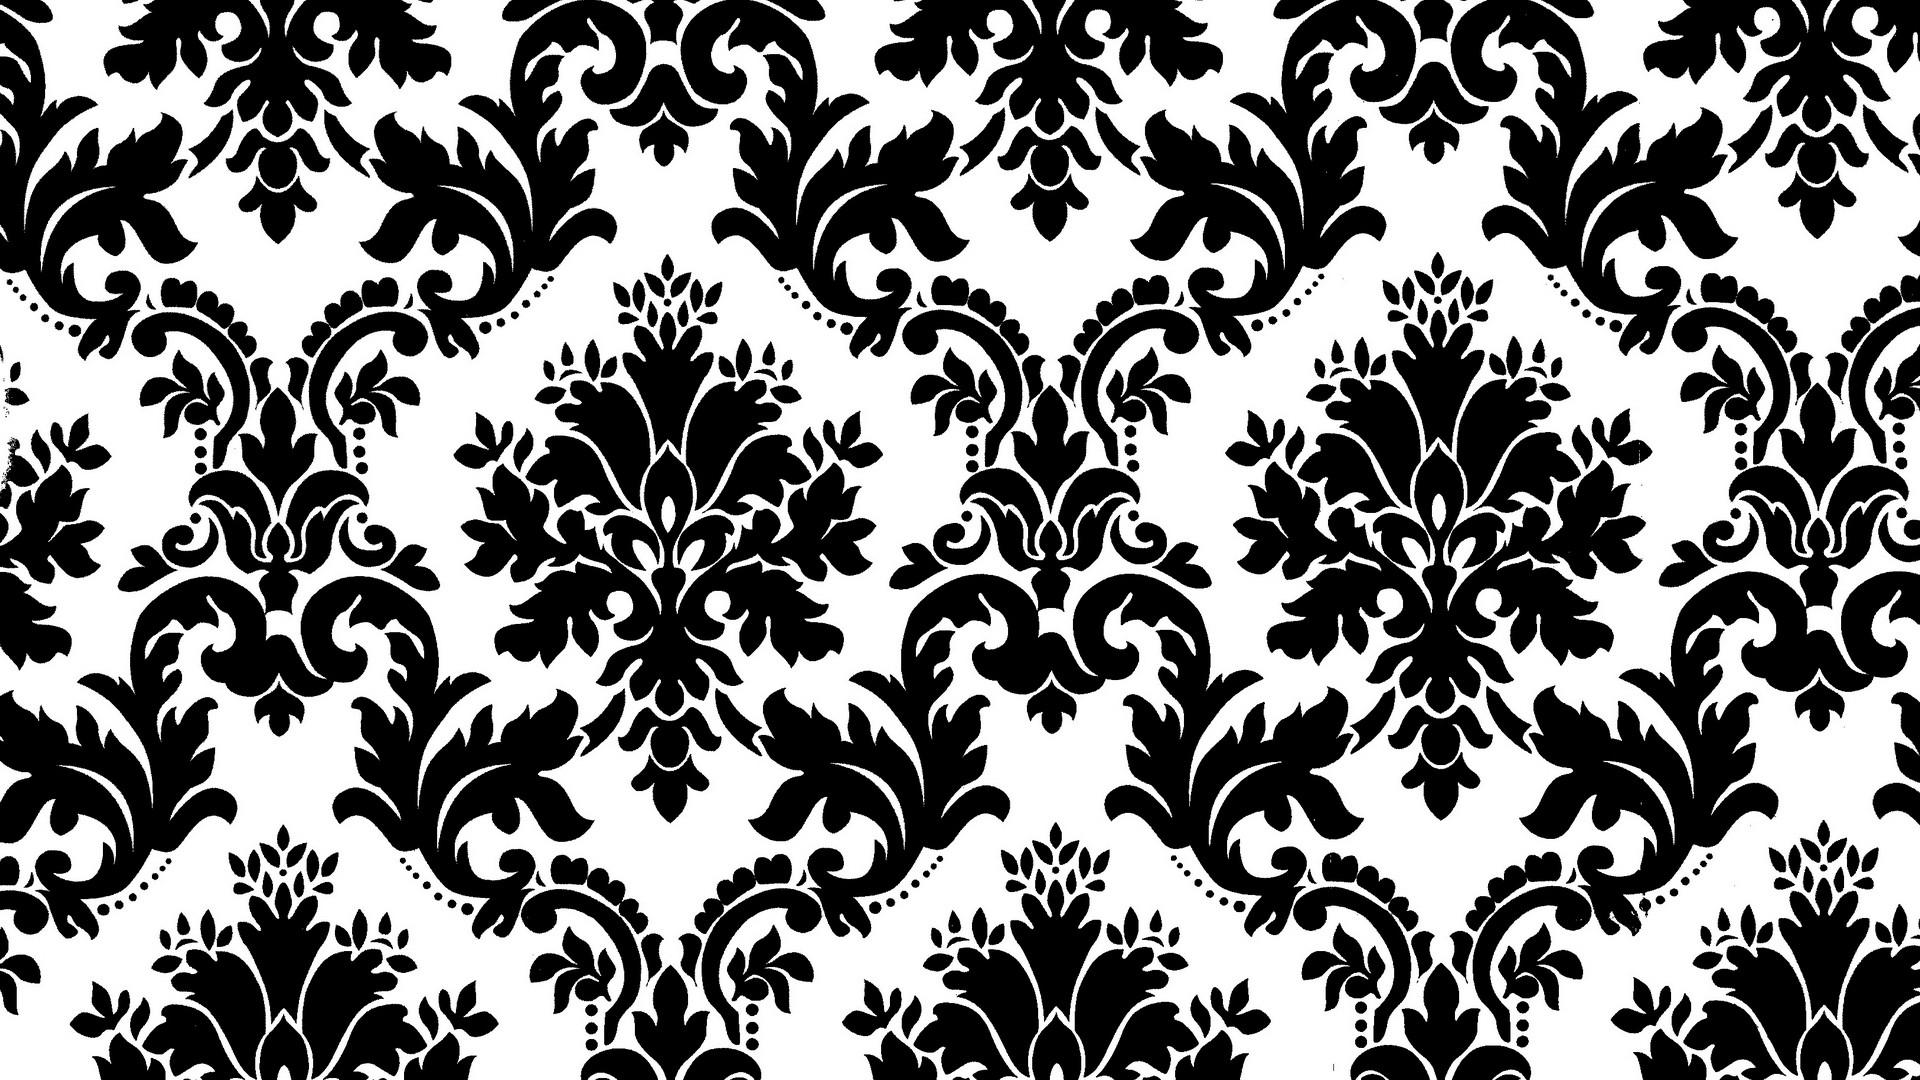 Pattern Wallpaper 1920x1080 40254